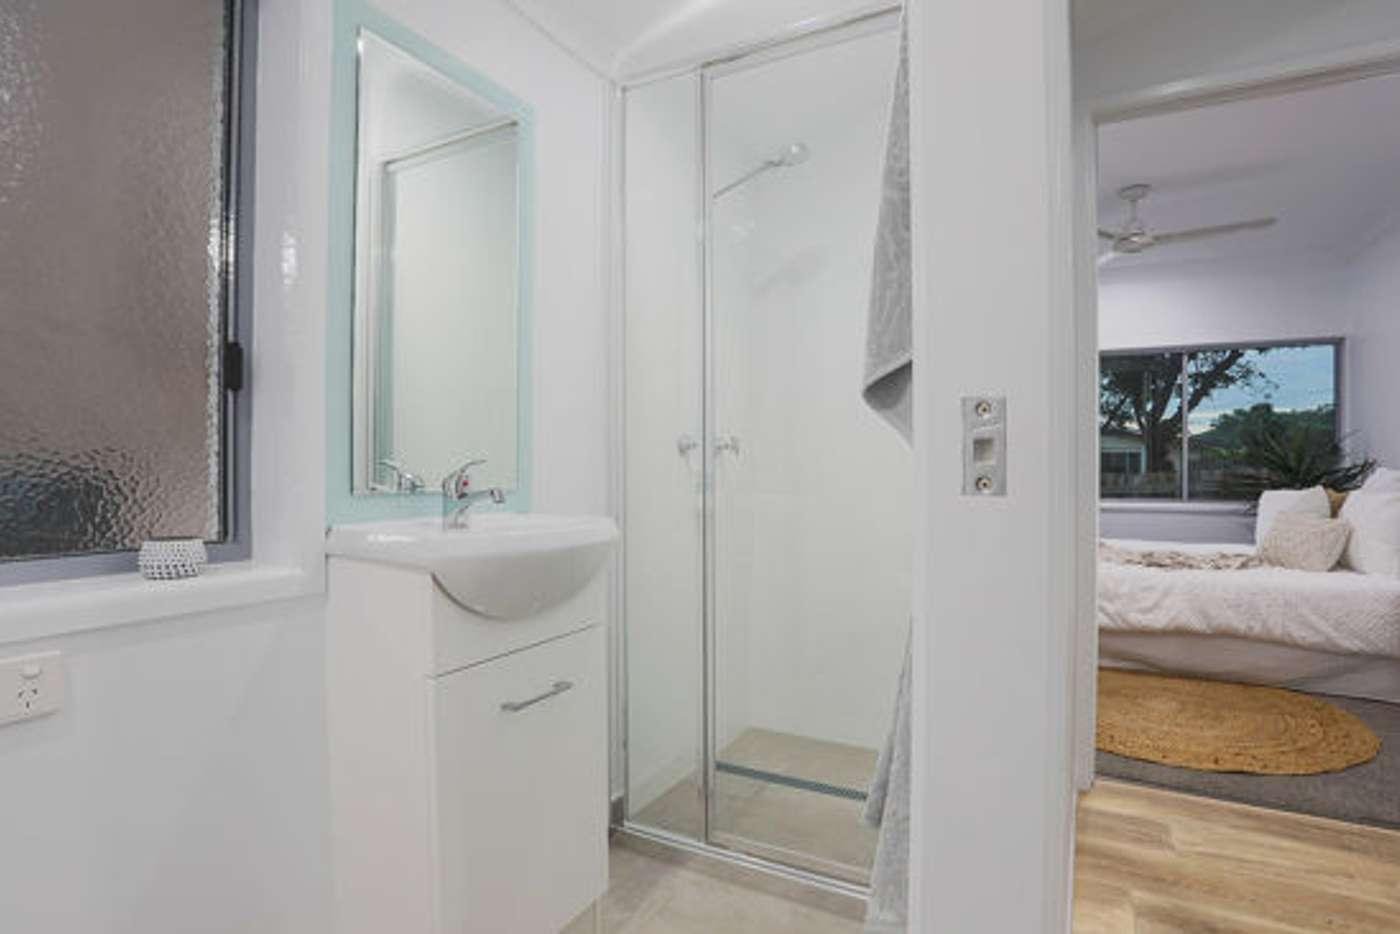 Seventh view of Homely house listing, 504 Mackay-Habana Road, Nindaroo QLD 4740